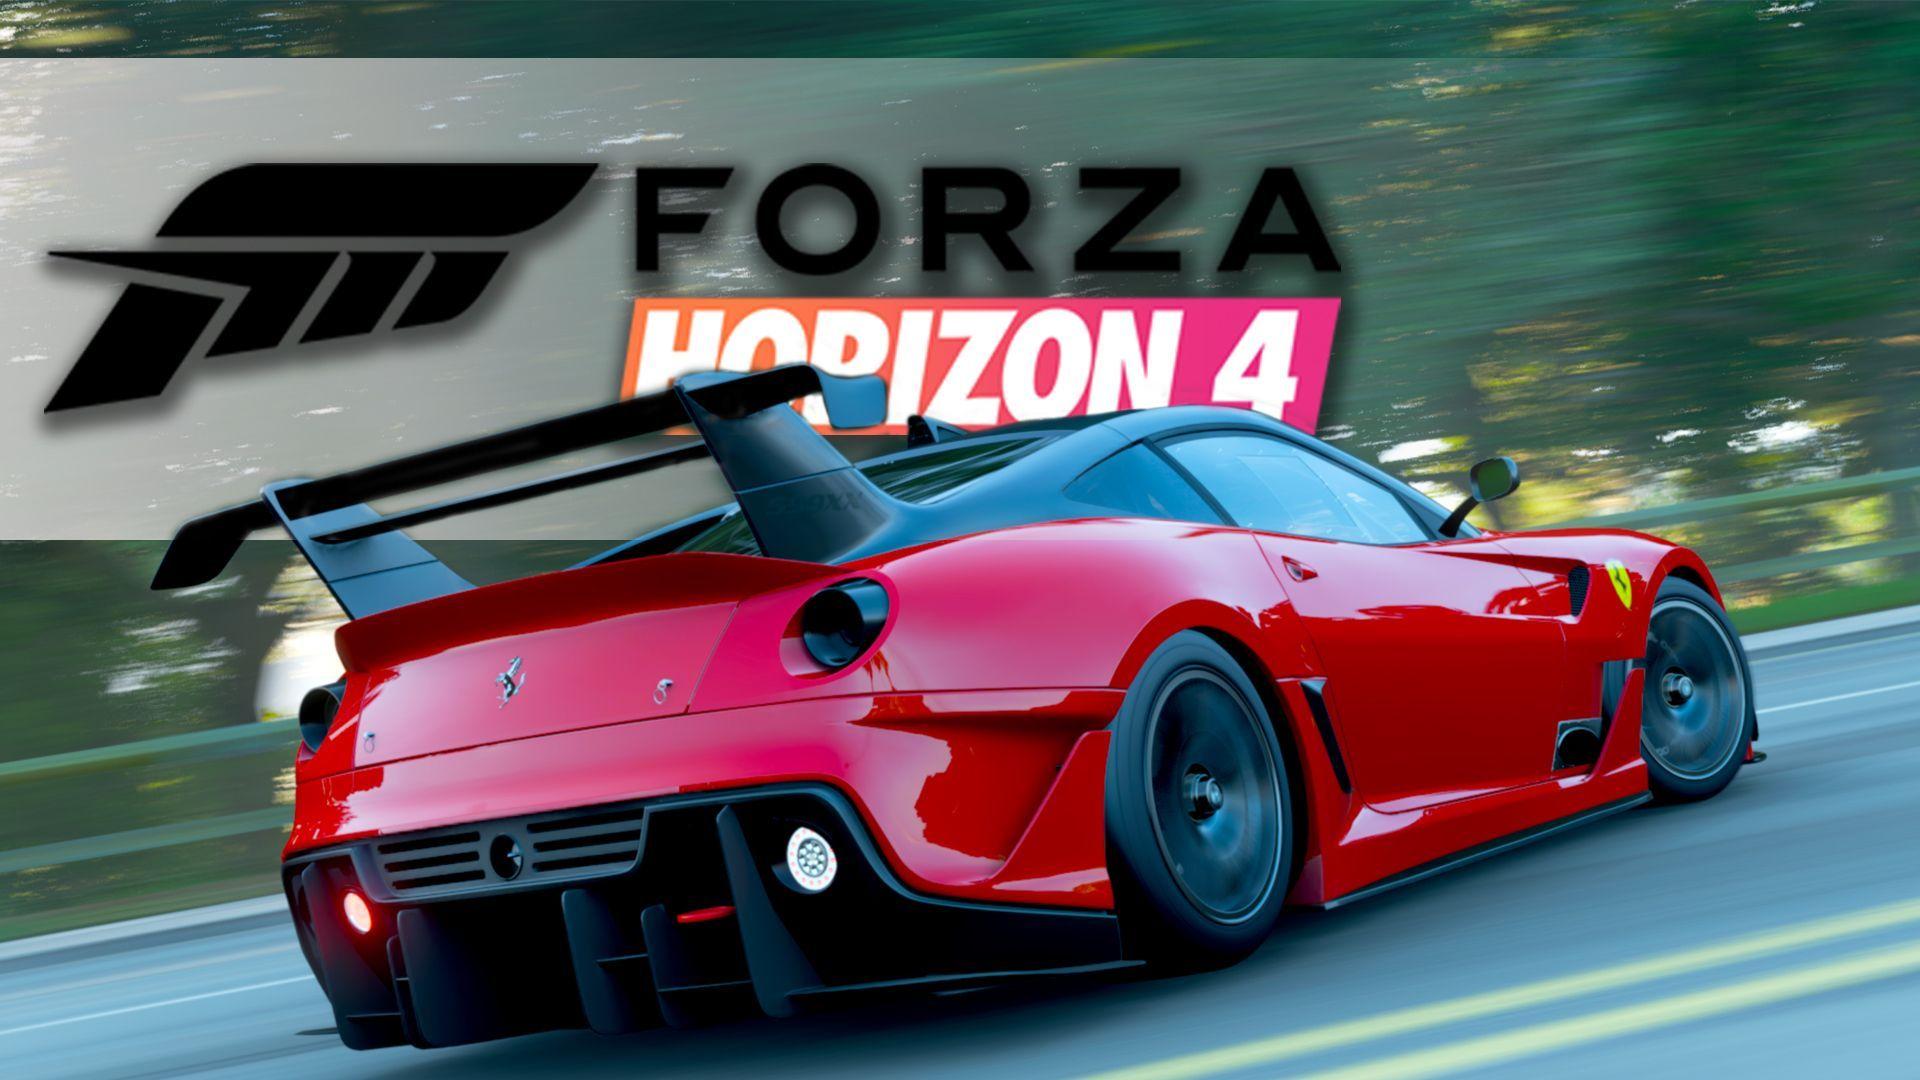 22 Fastest Cars In Forza Horizon 4 In 2021 Forza Horizon Forza Horizon 4 Forza